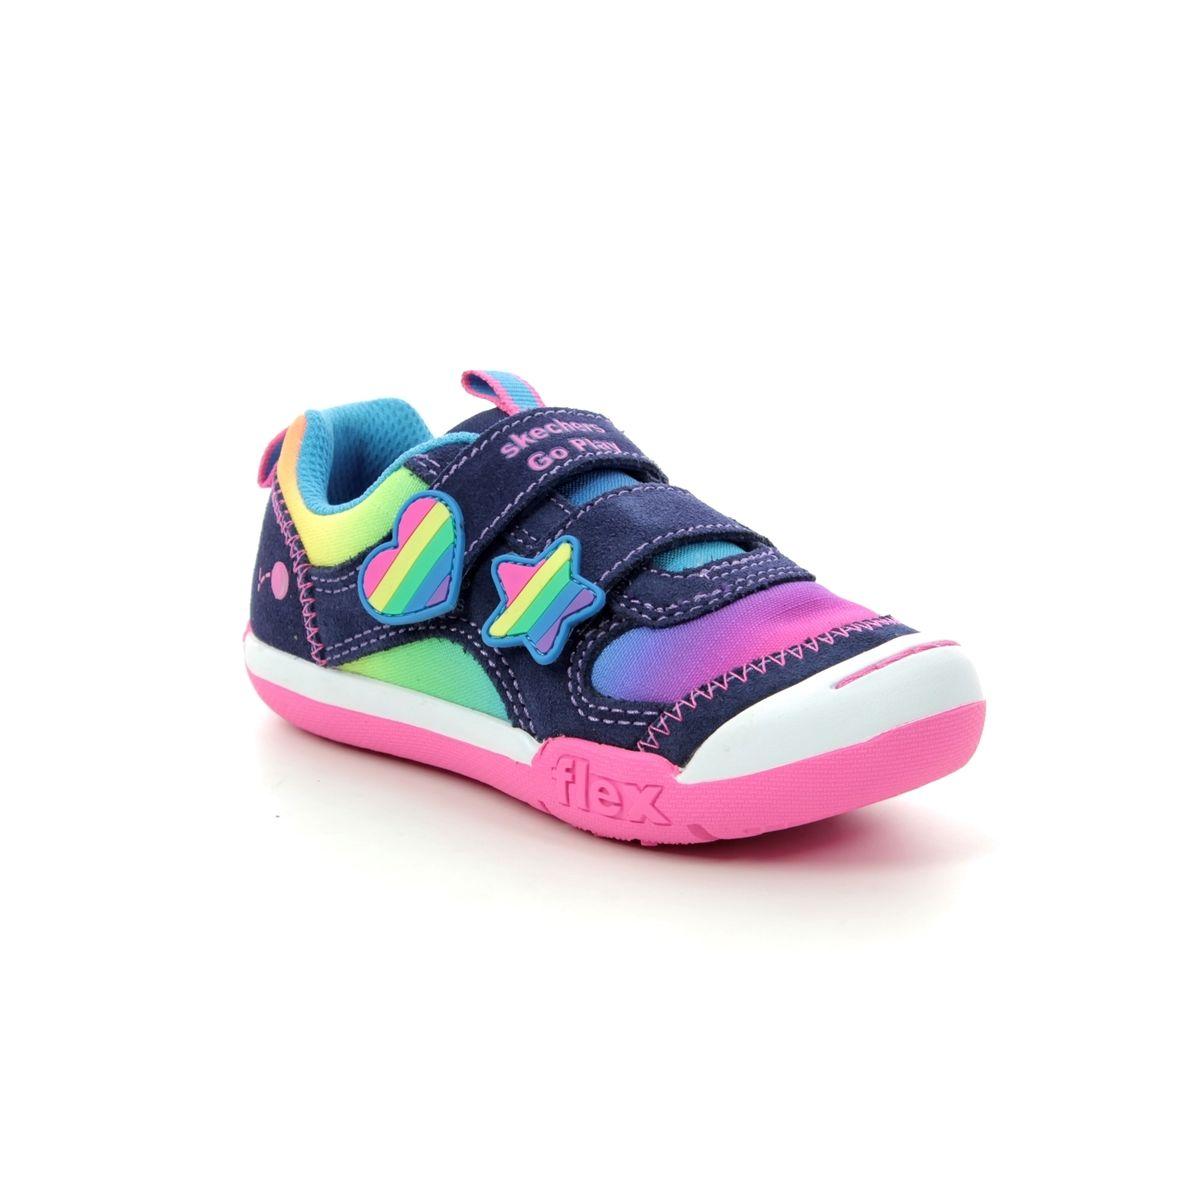 skechers rainbow shoes